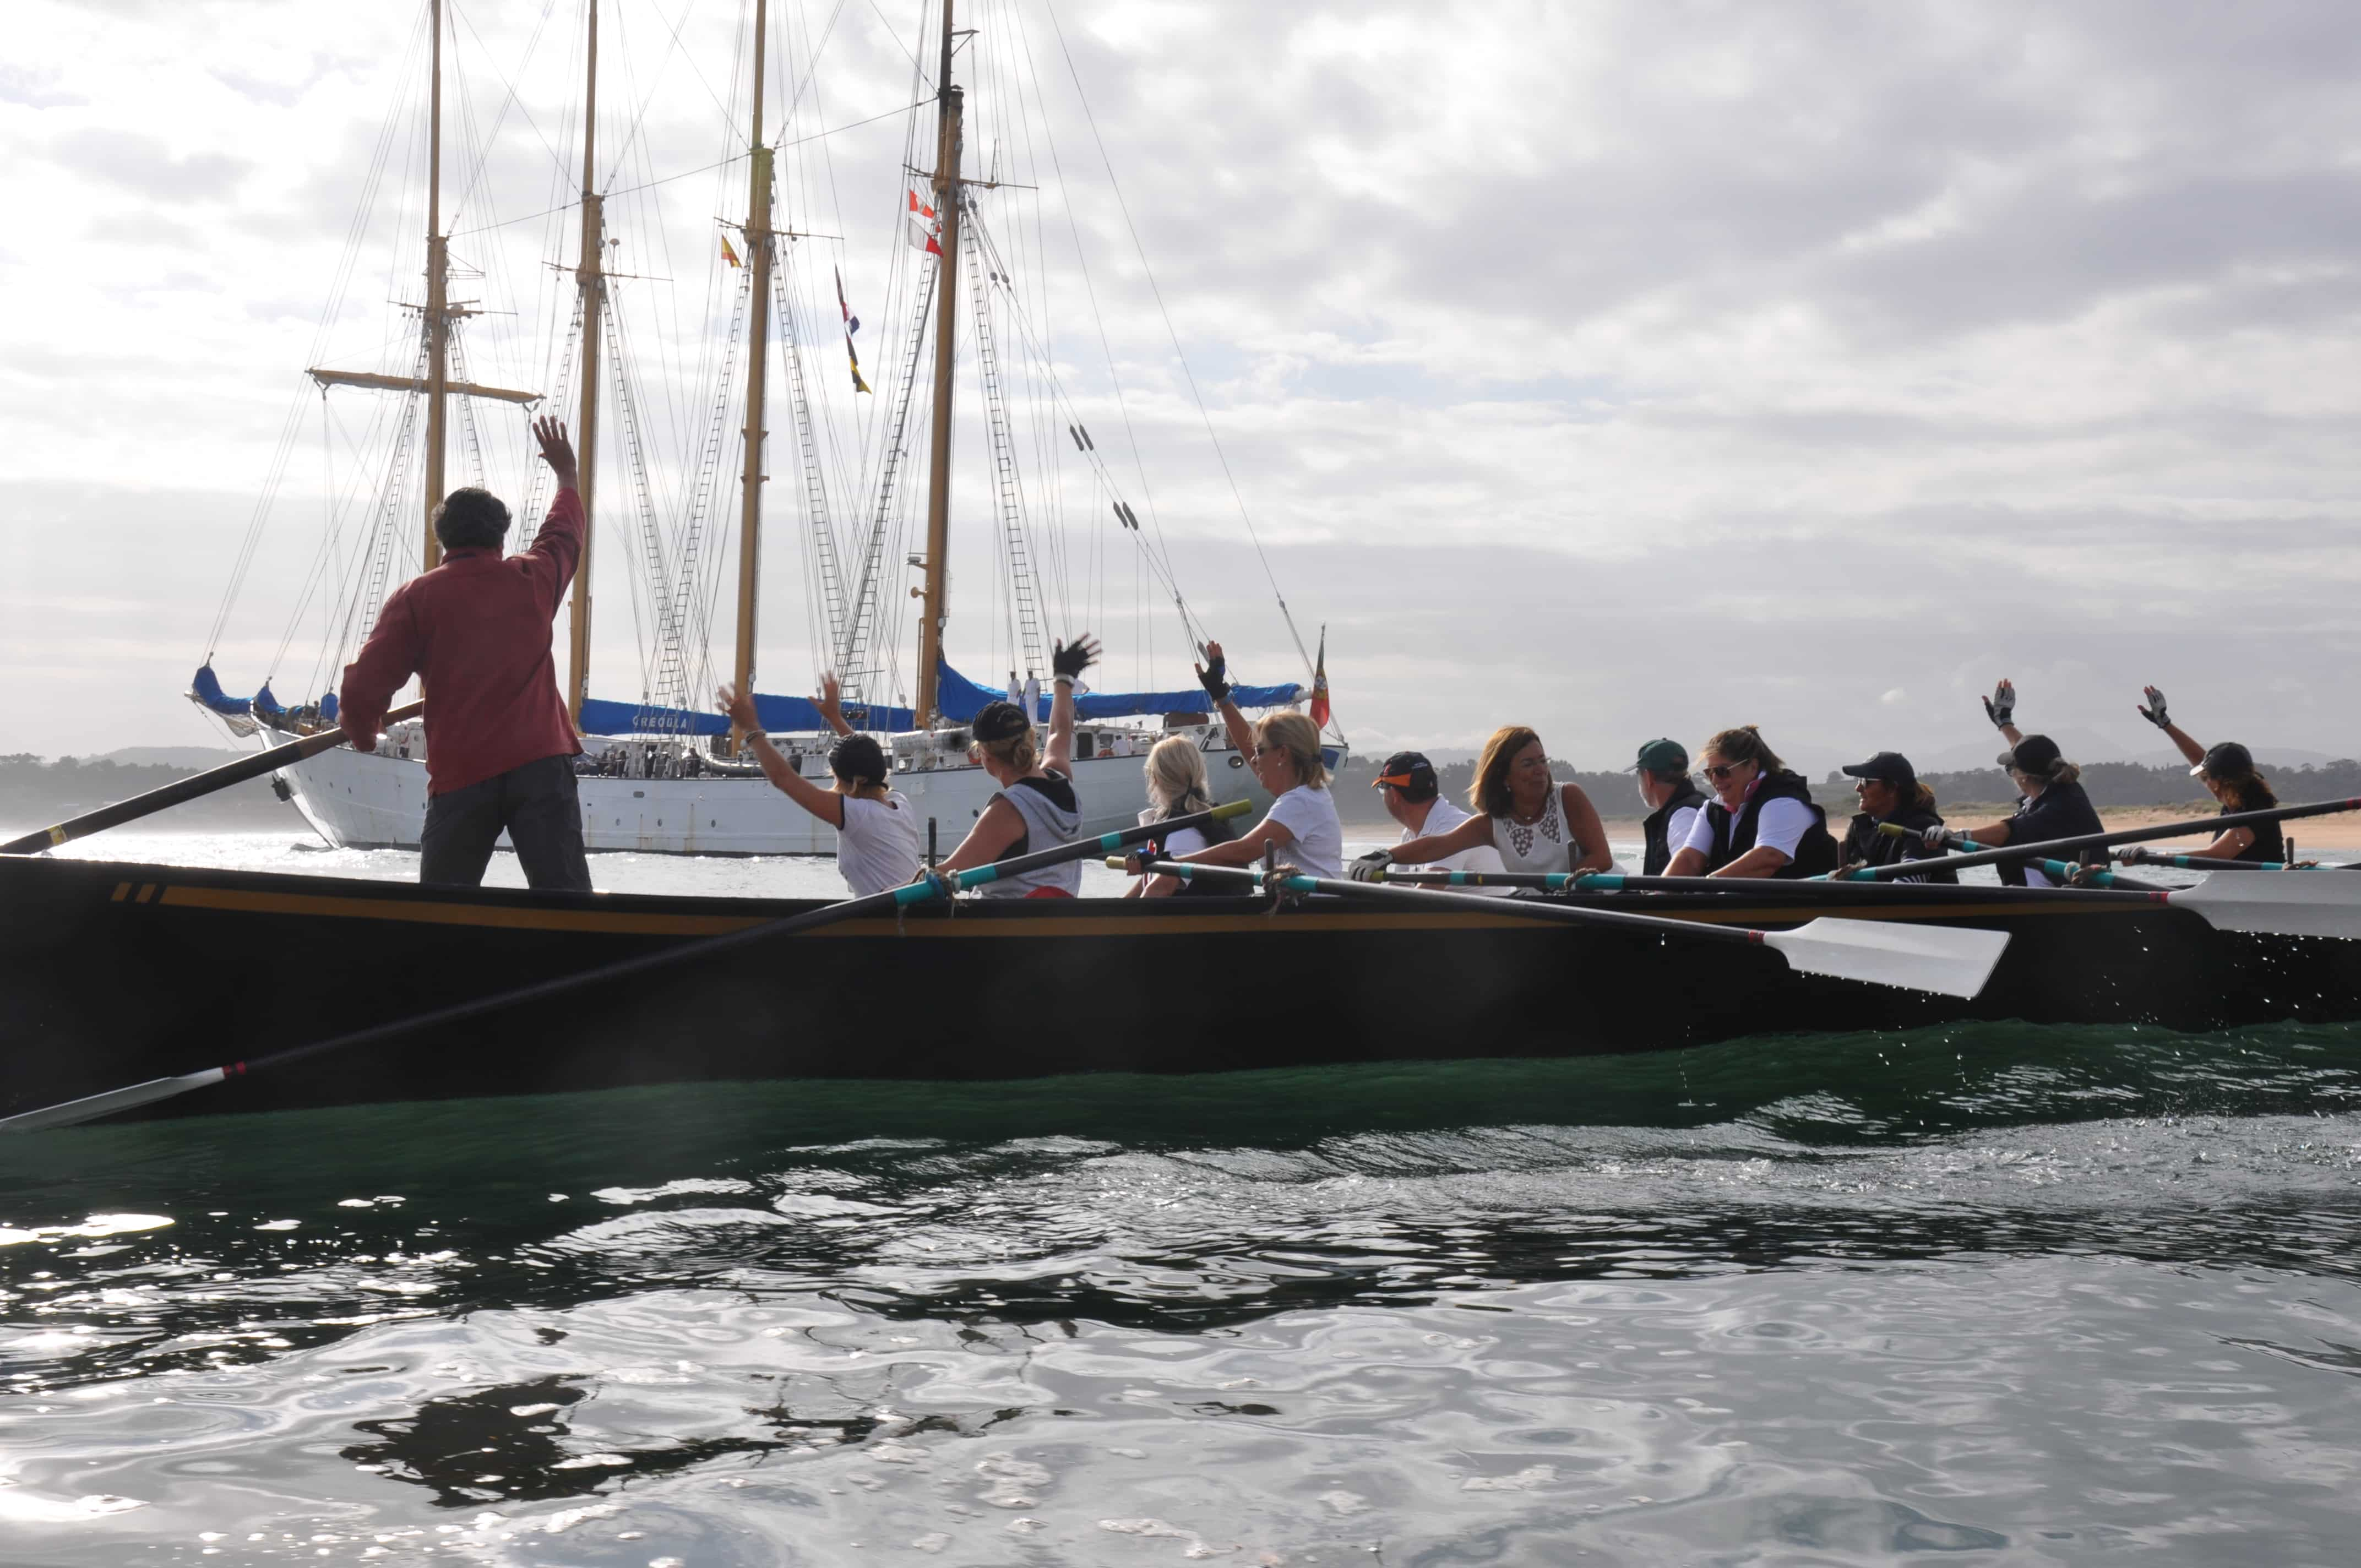 The'Navigatio Santander' comes a little closer